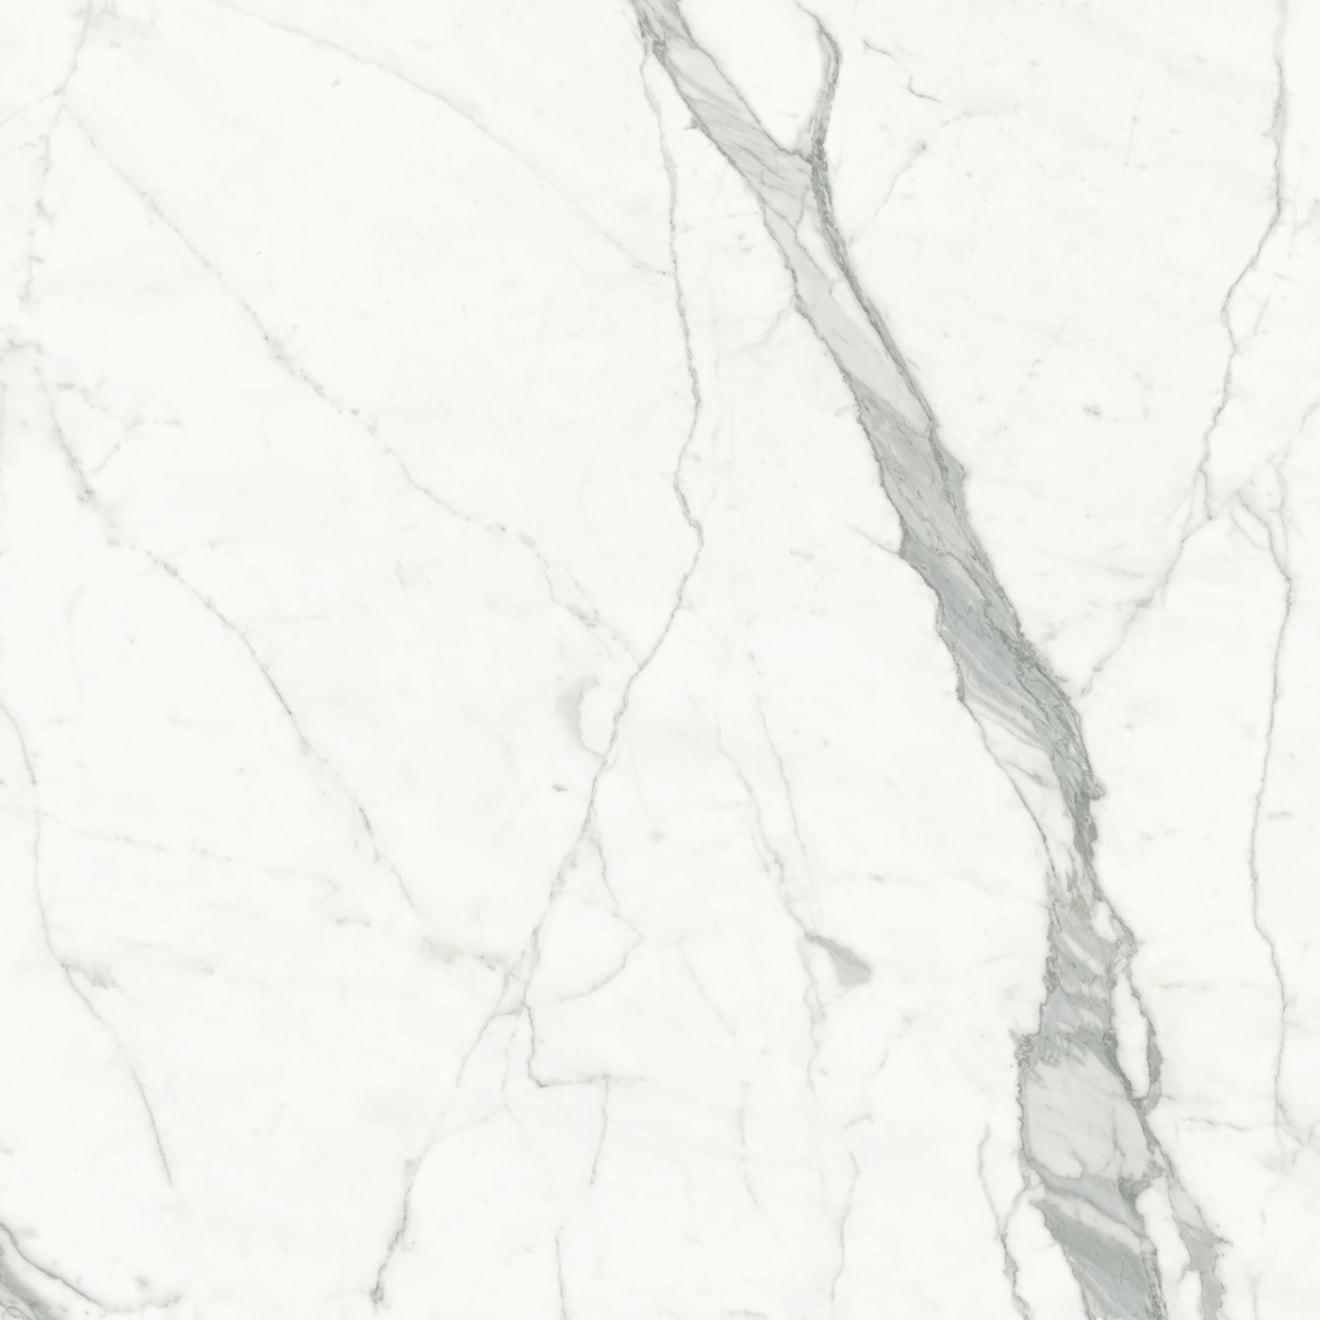 Magnifica Statuario Super White Porcelain in 1/4